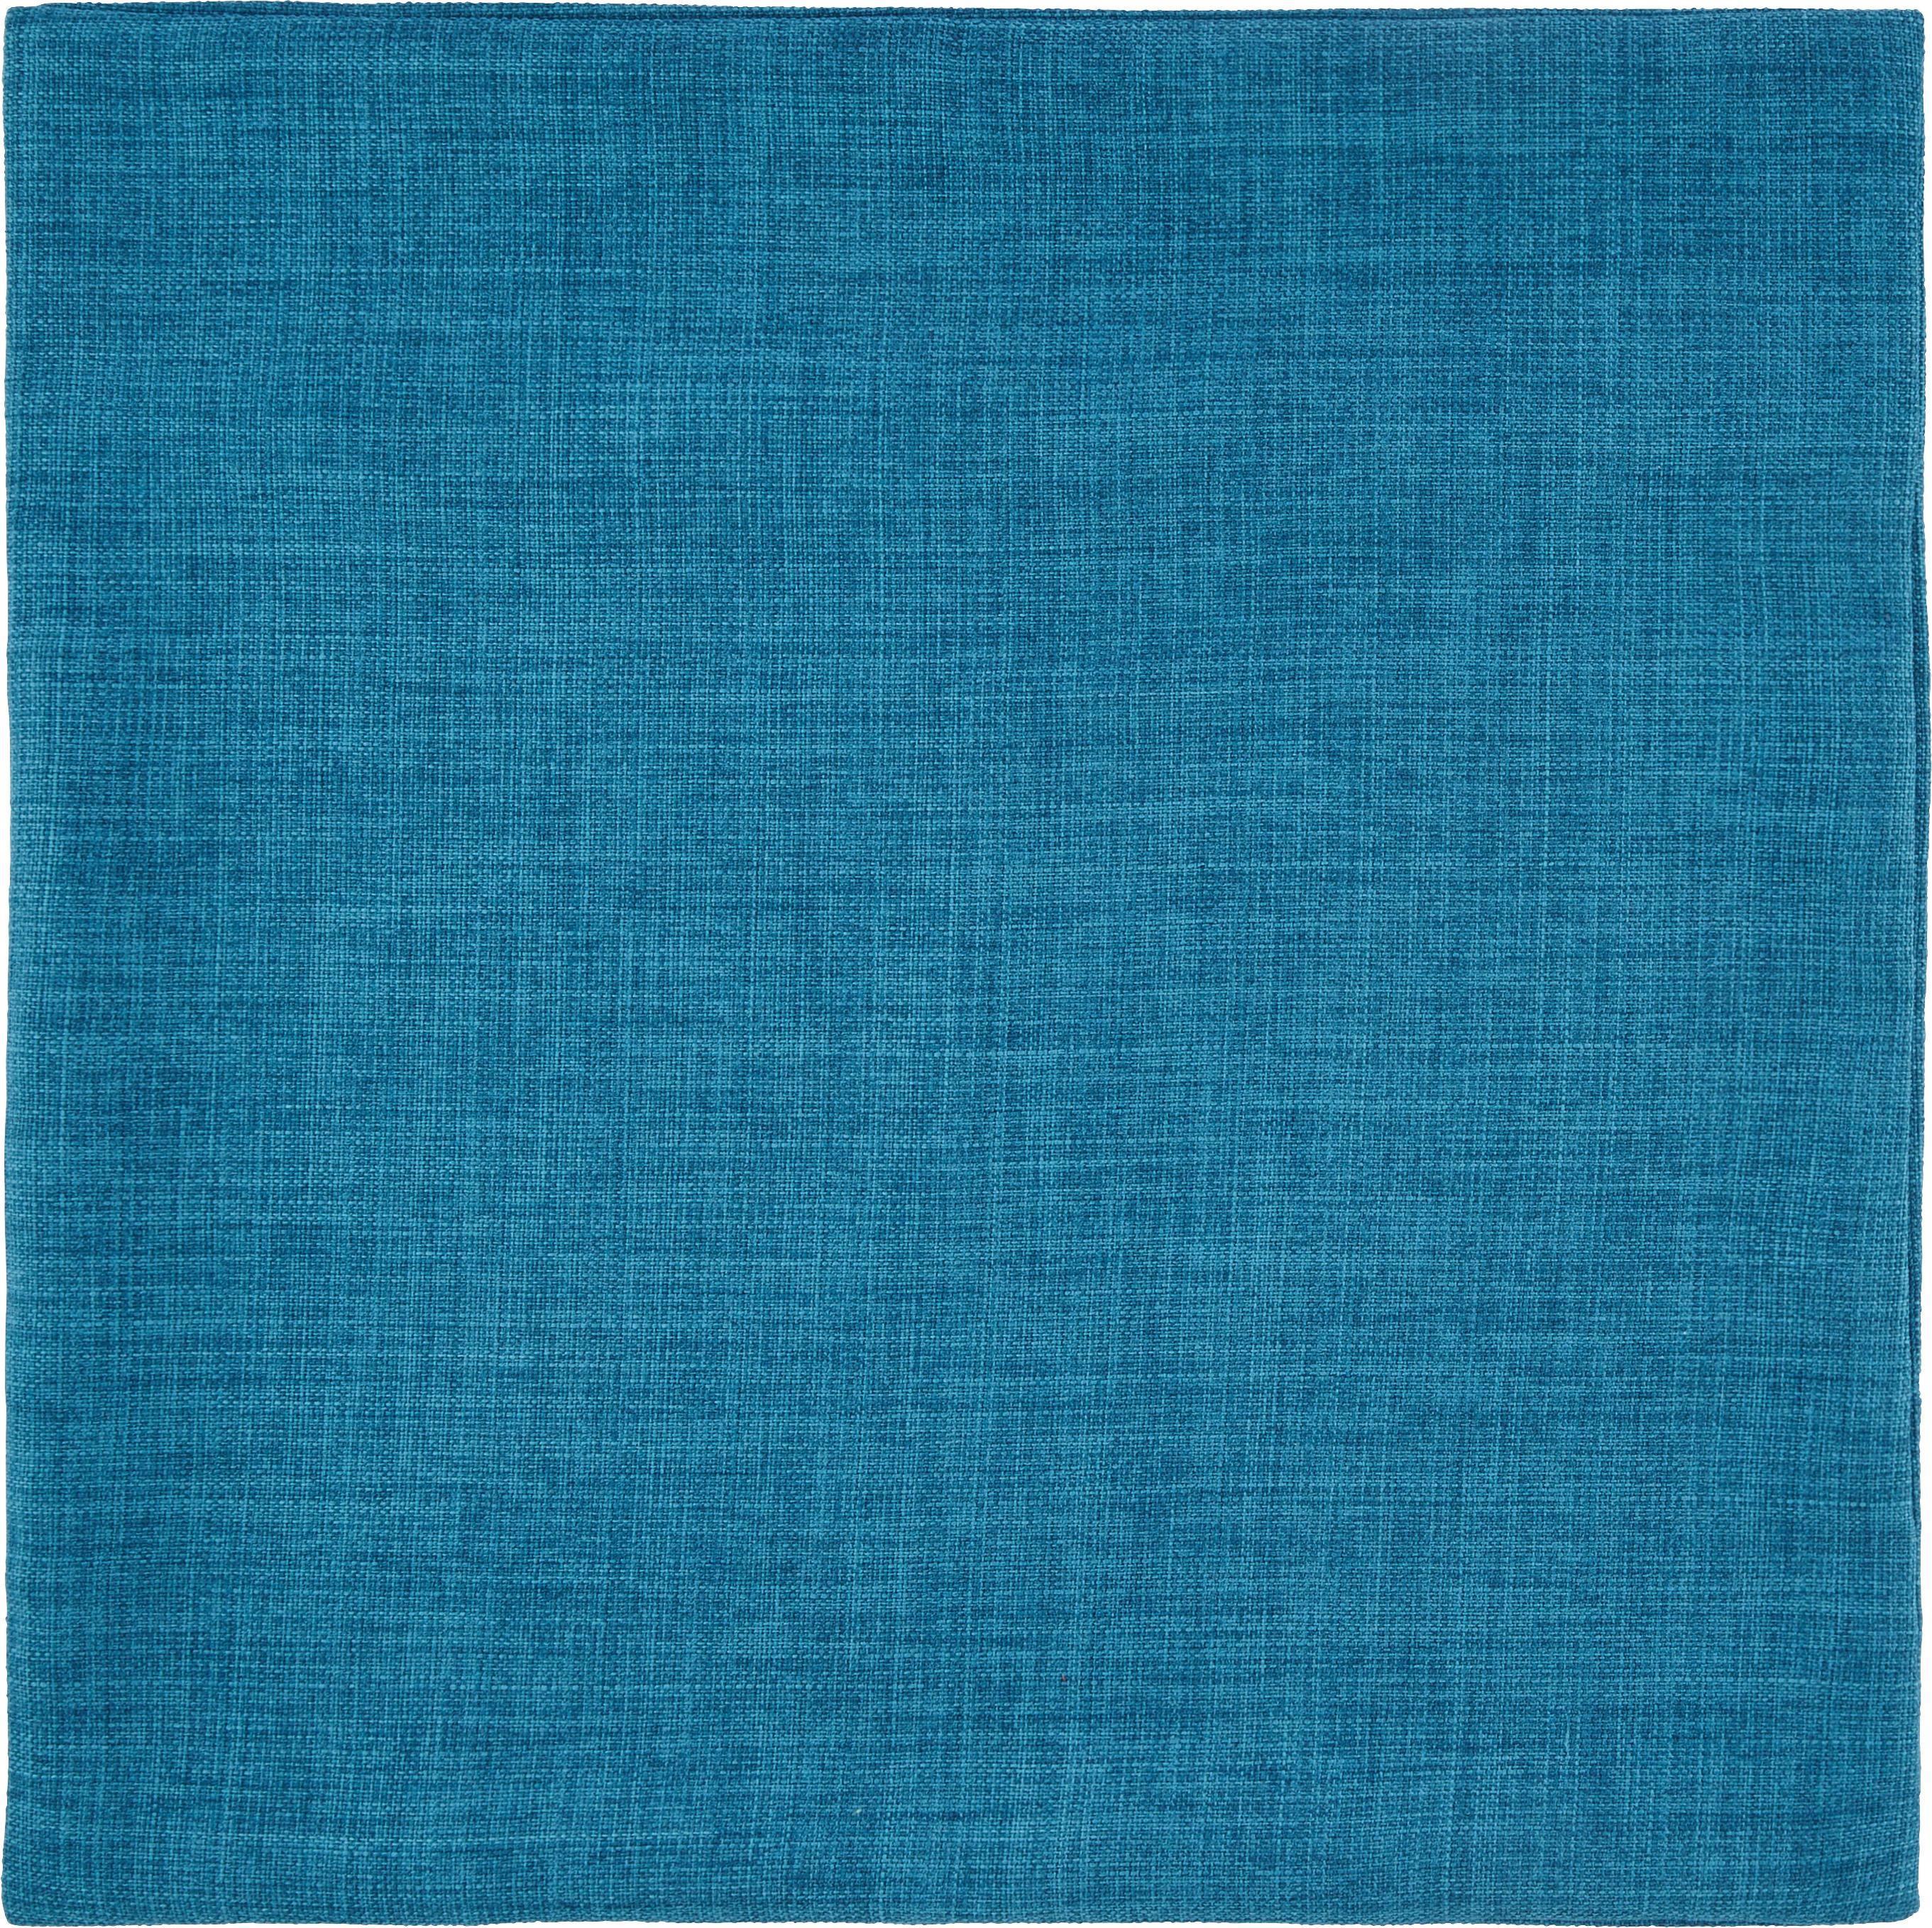 Párnahuzat Leinenoptik - türkiz, konvencionális, textil (50/50cm) - MÖMAX modern living